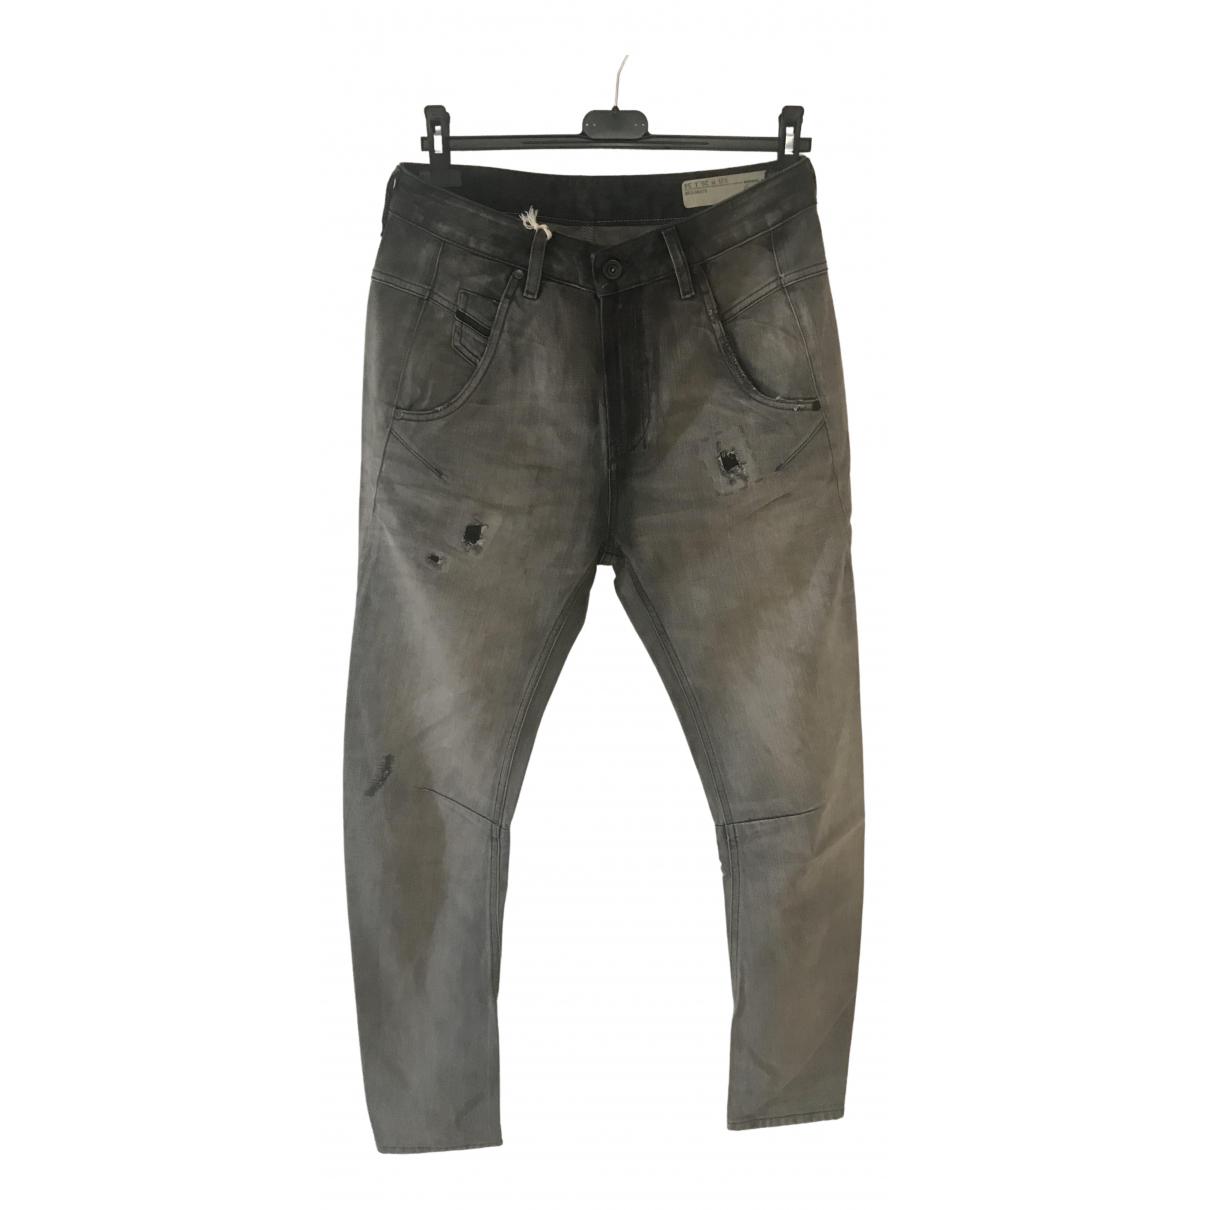 Diesel \N Grey Cotton Jeans for Women 36 FR